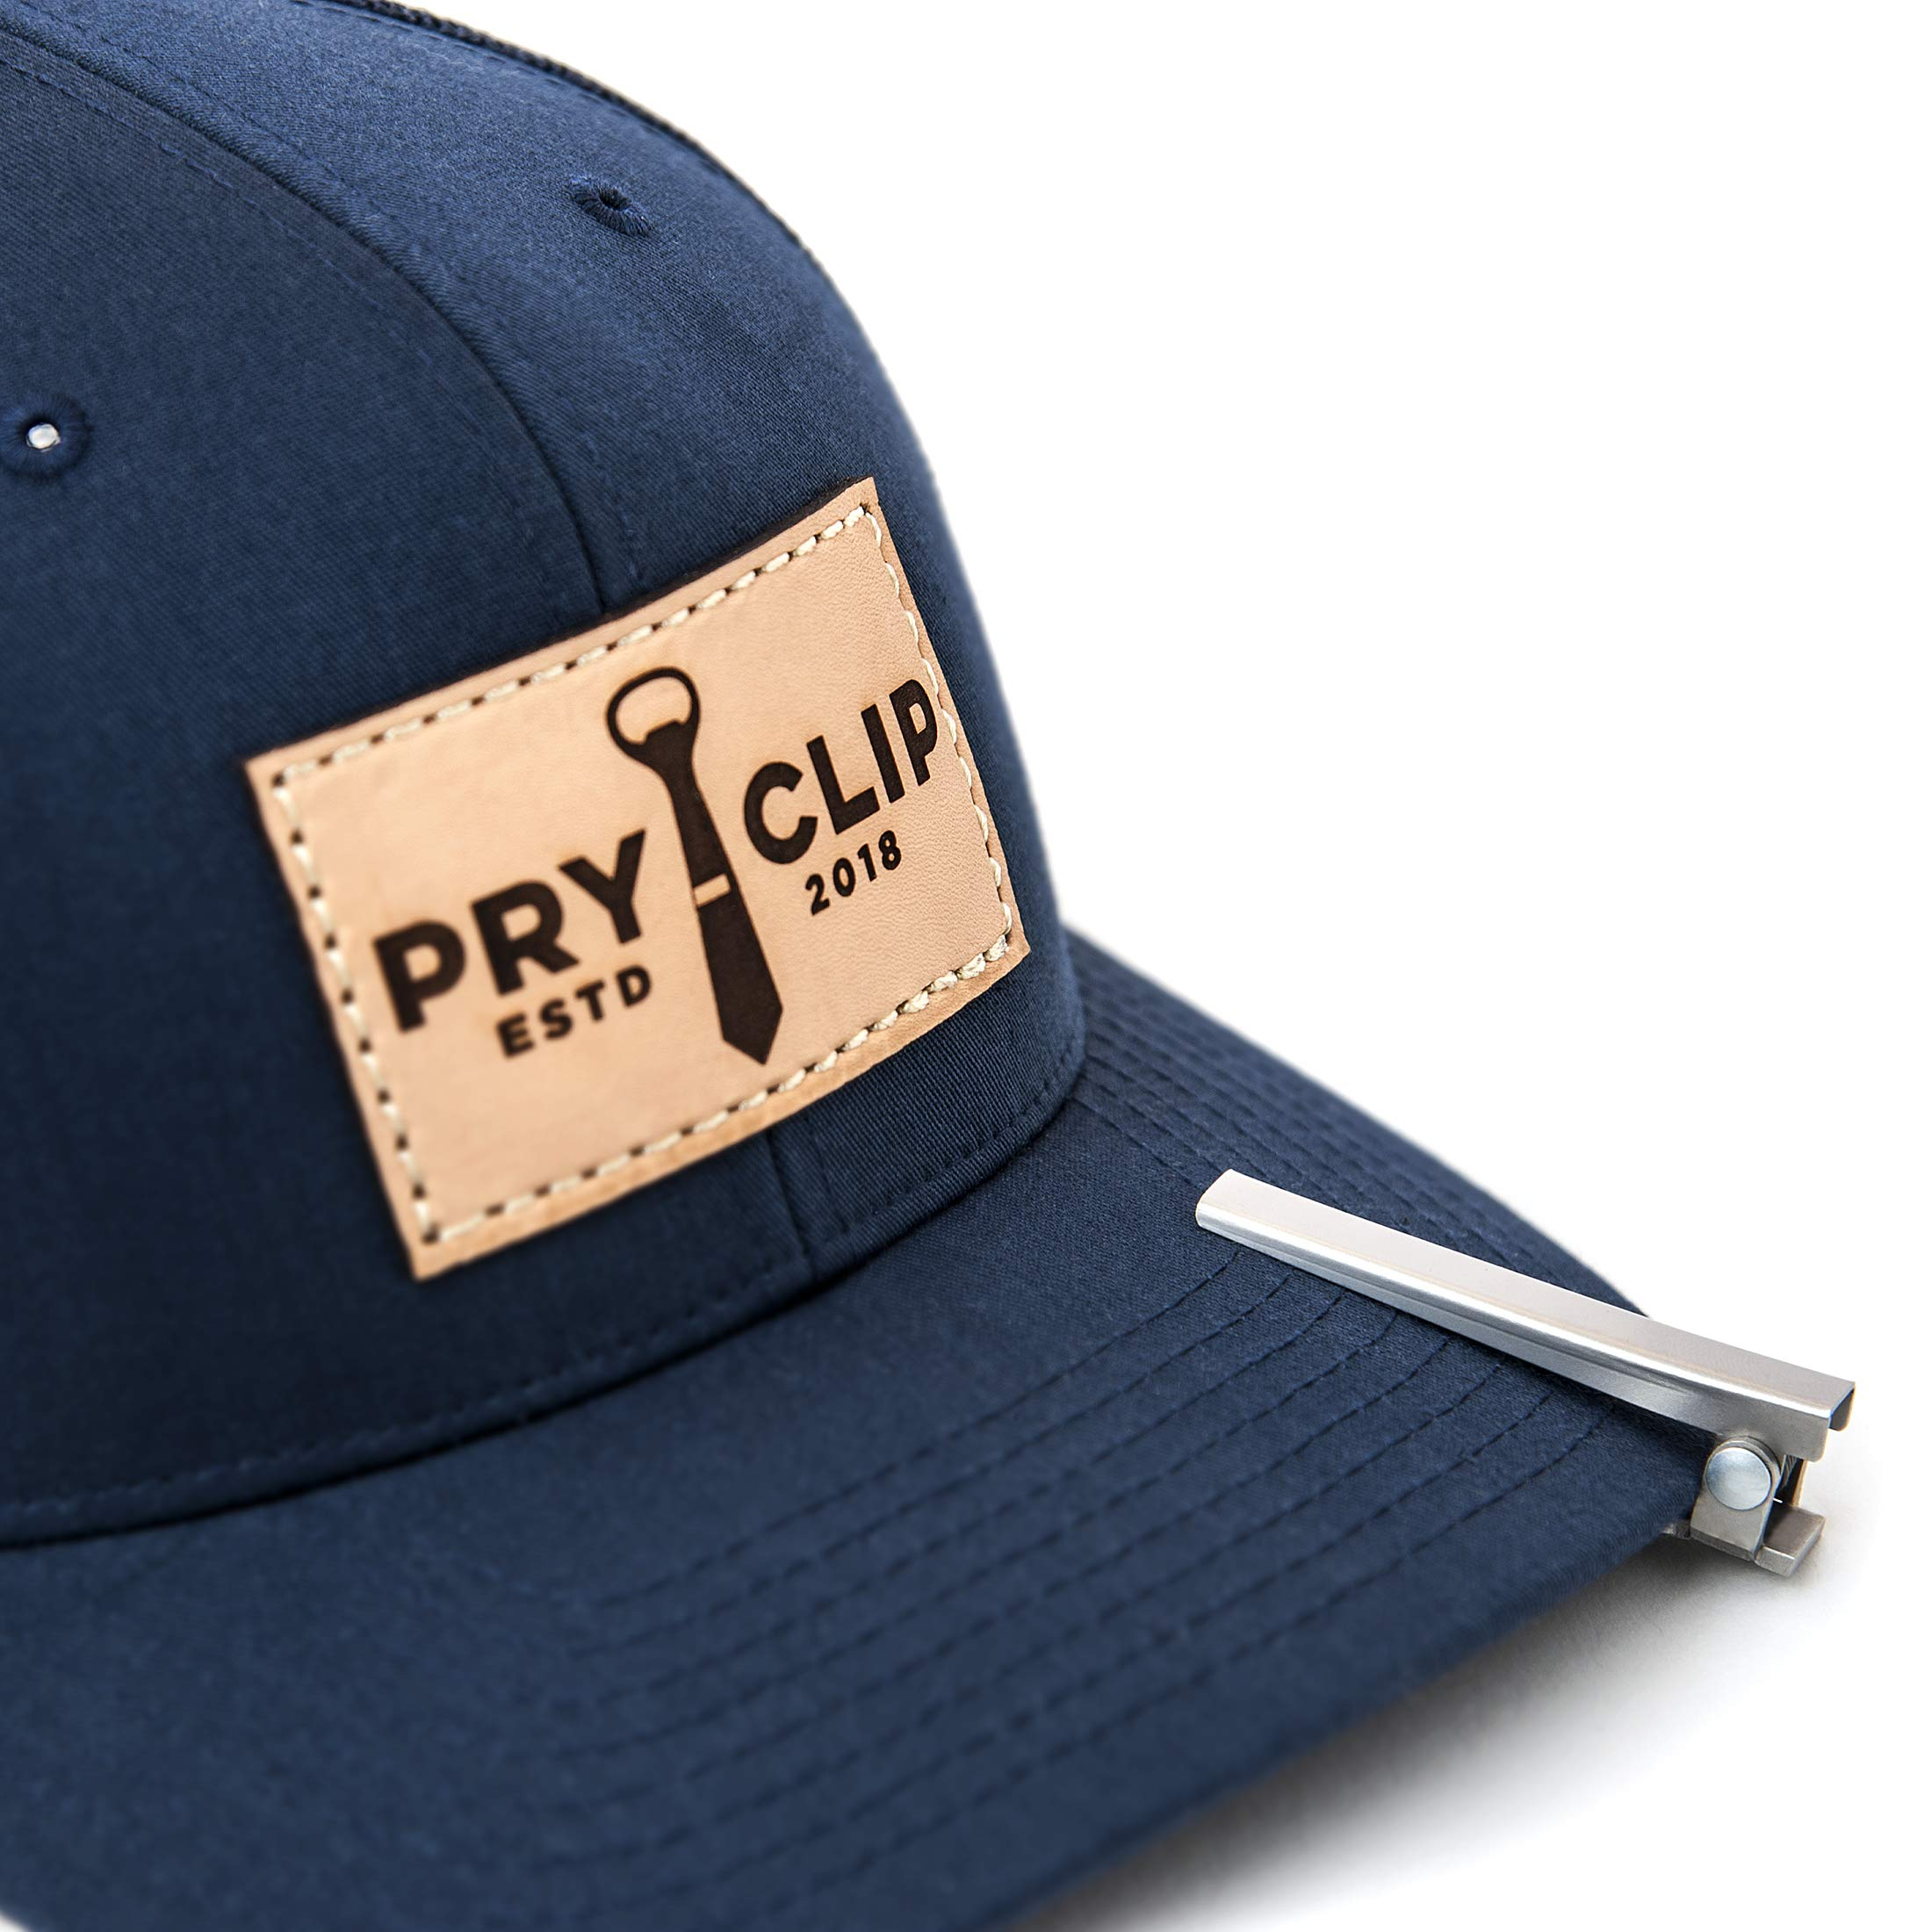 PRYCLIP - Tie Clip Bottle Opener, Laser Engraved, Gift Bag Included by PRYCLIP (Image #4)